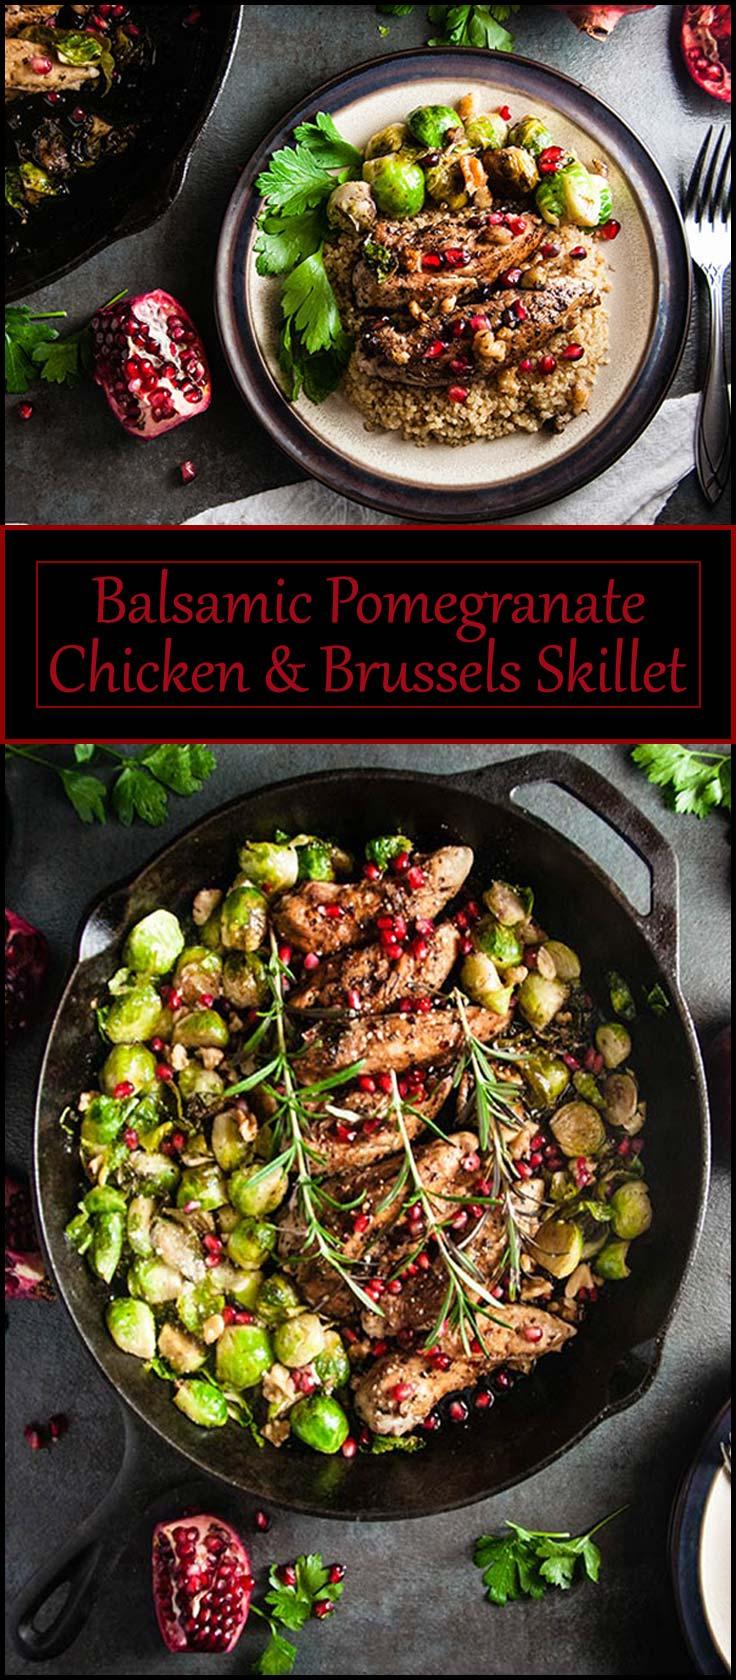 Balsamic Pomegranate Chicken Skillet from www.seasonedsprinkles.com